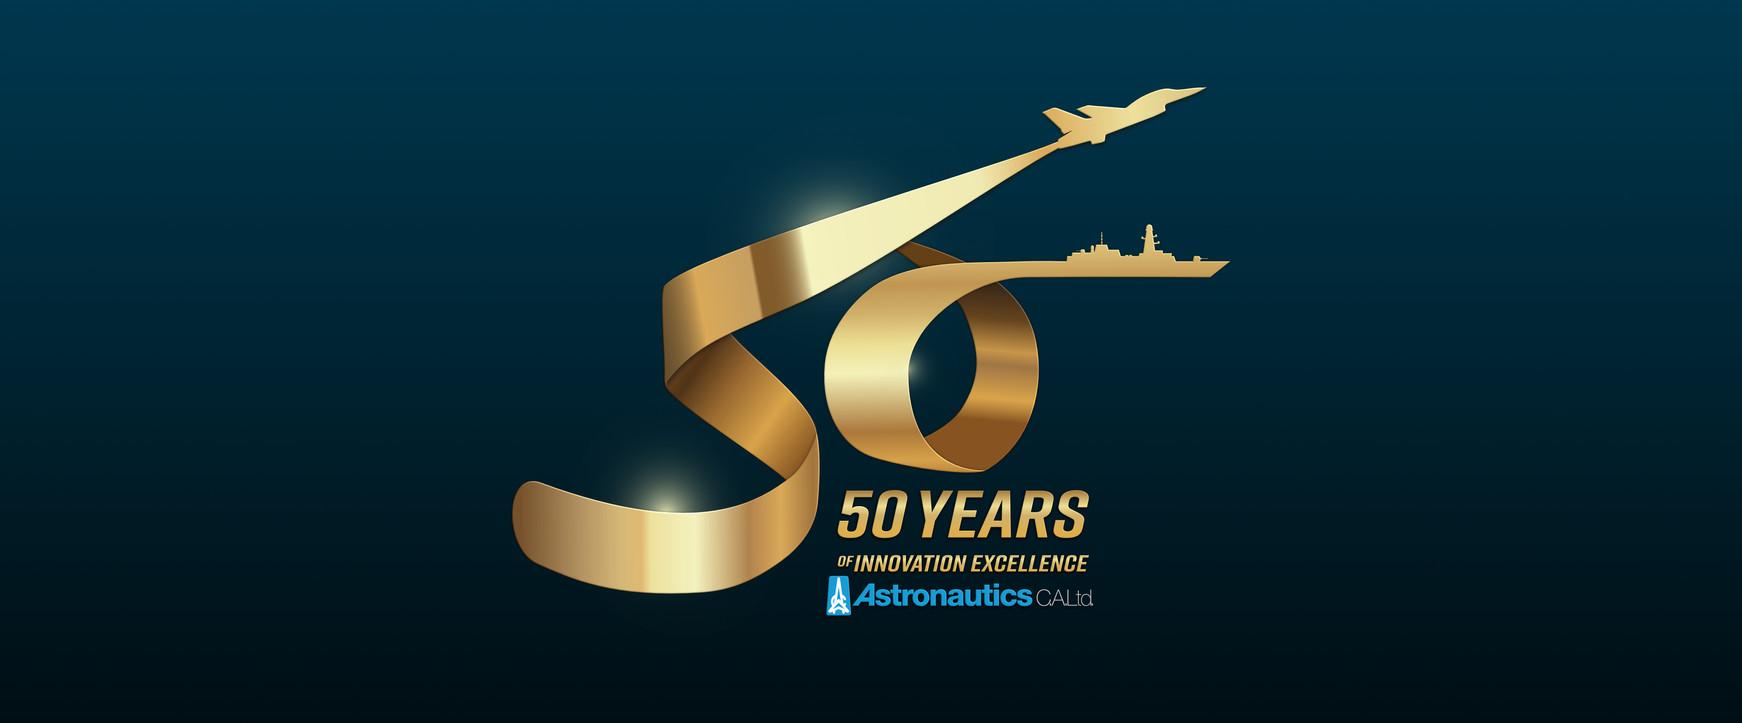 Astronautics - 50th Anniversary LOGO - S